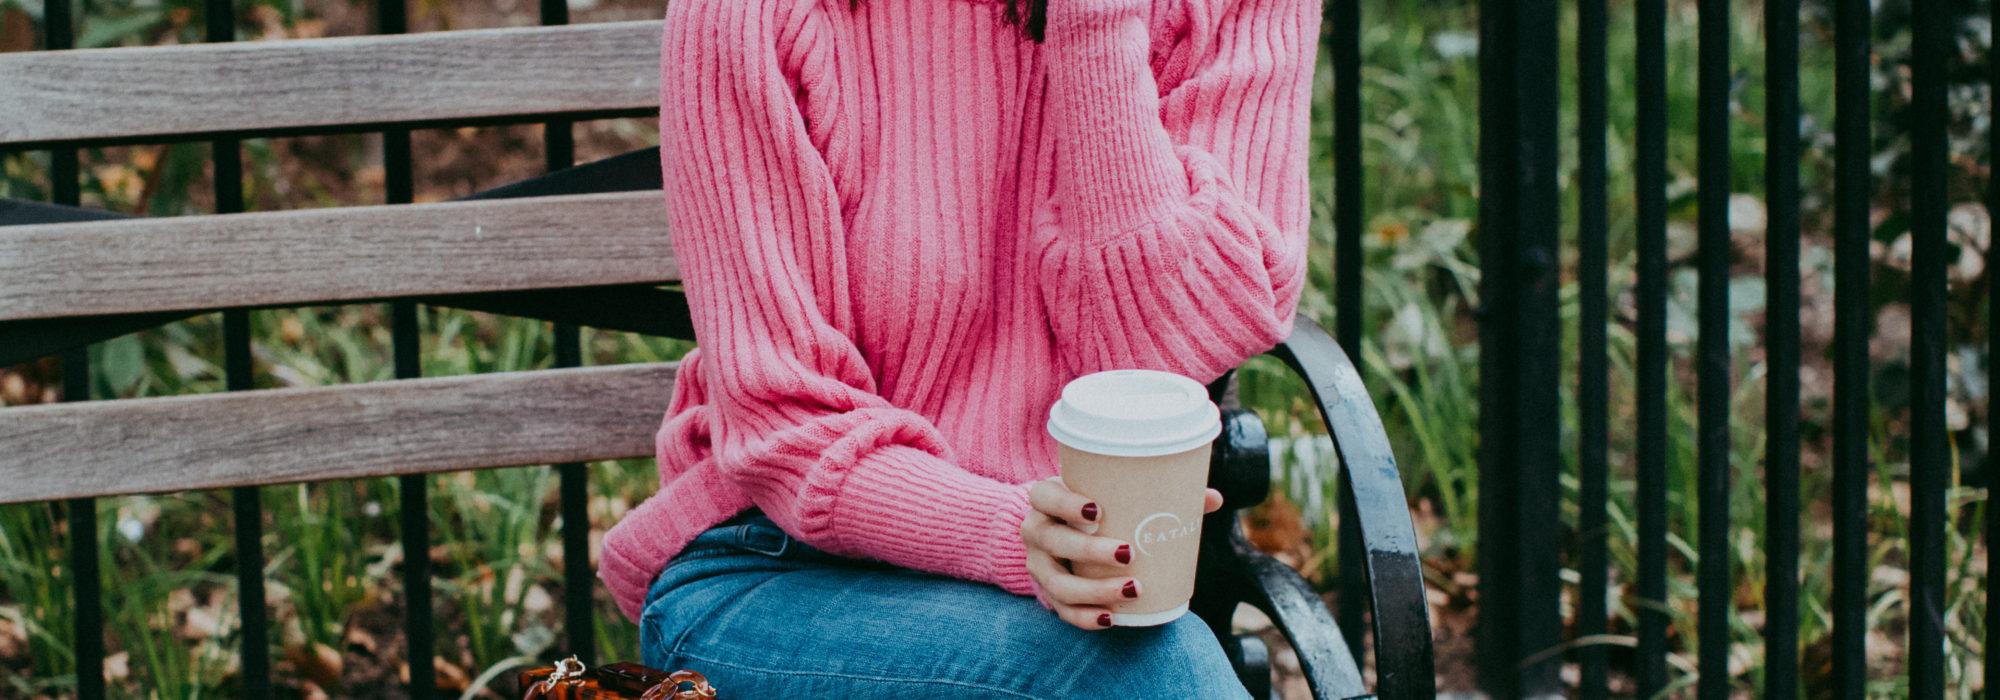 The Prettiest Pink Sweater